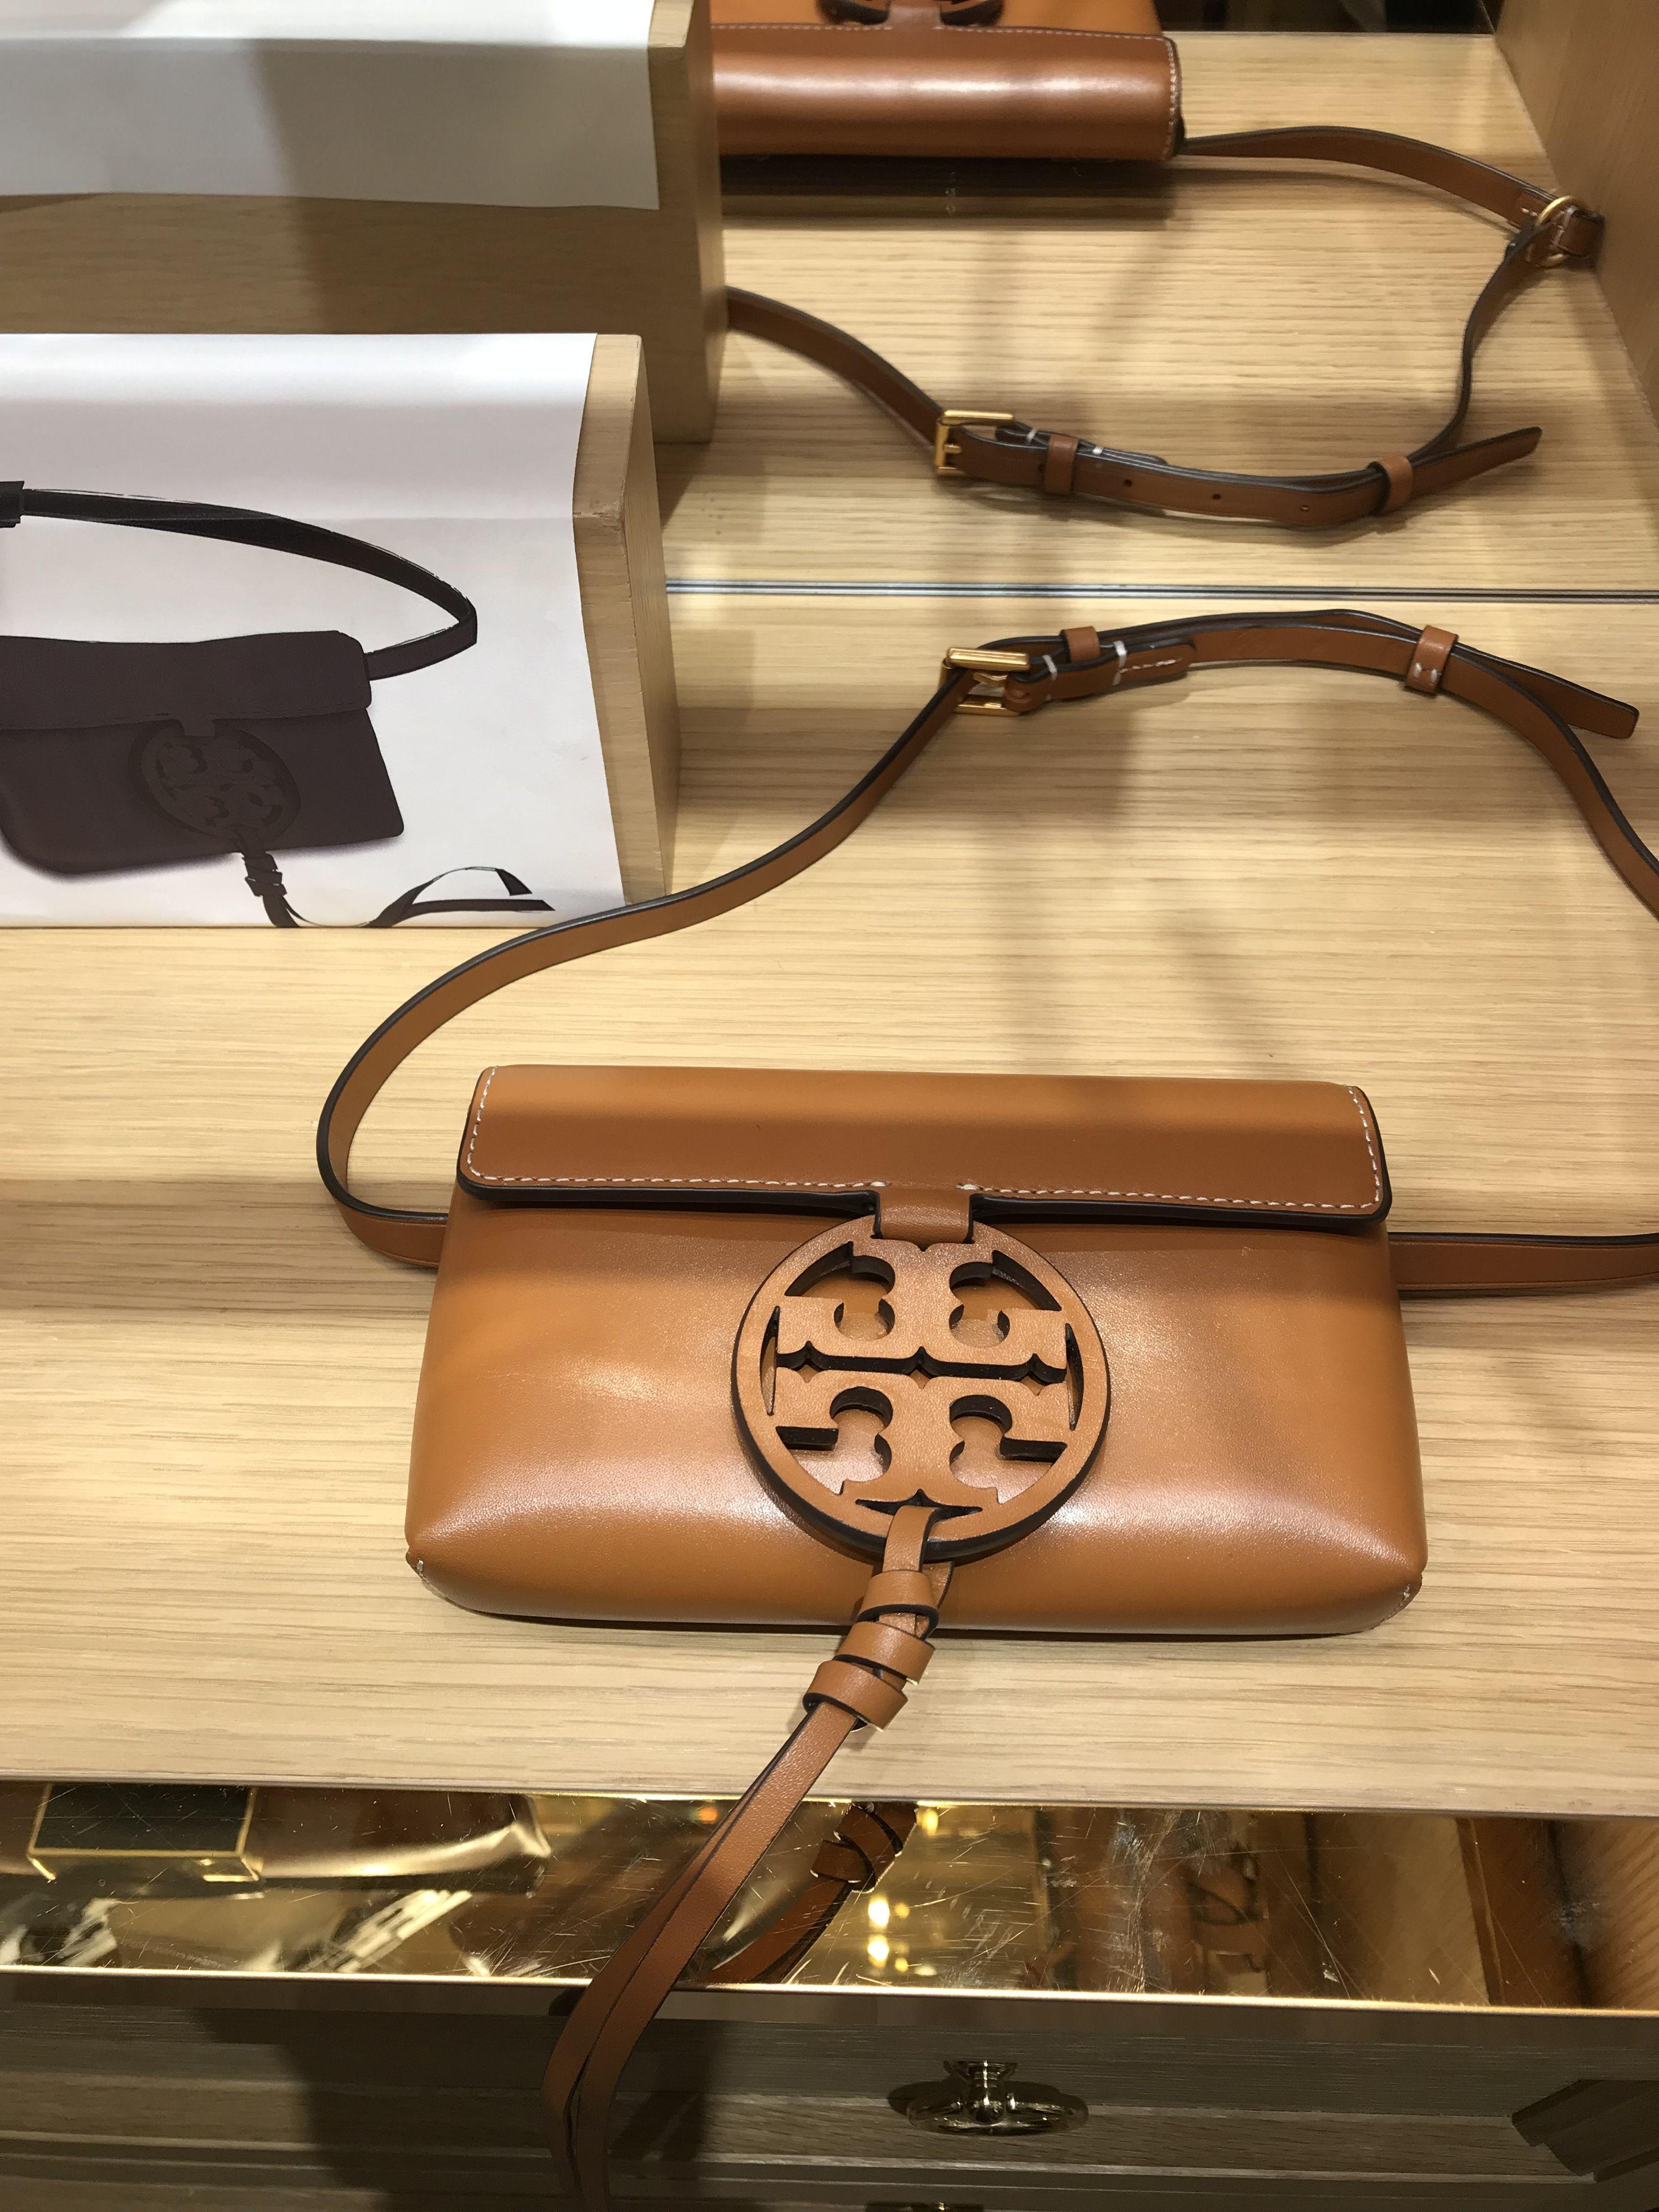 00e087c6cde Miller Belt Bag   Tory Burch Handbags November 2018 in 2019   Bags ...